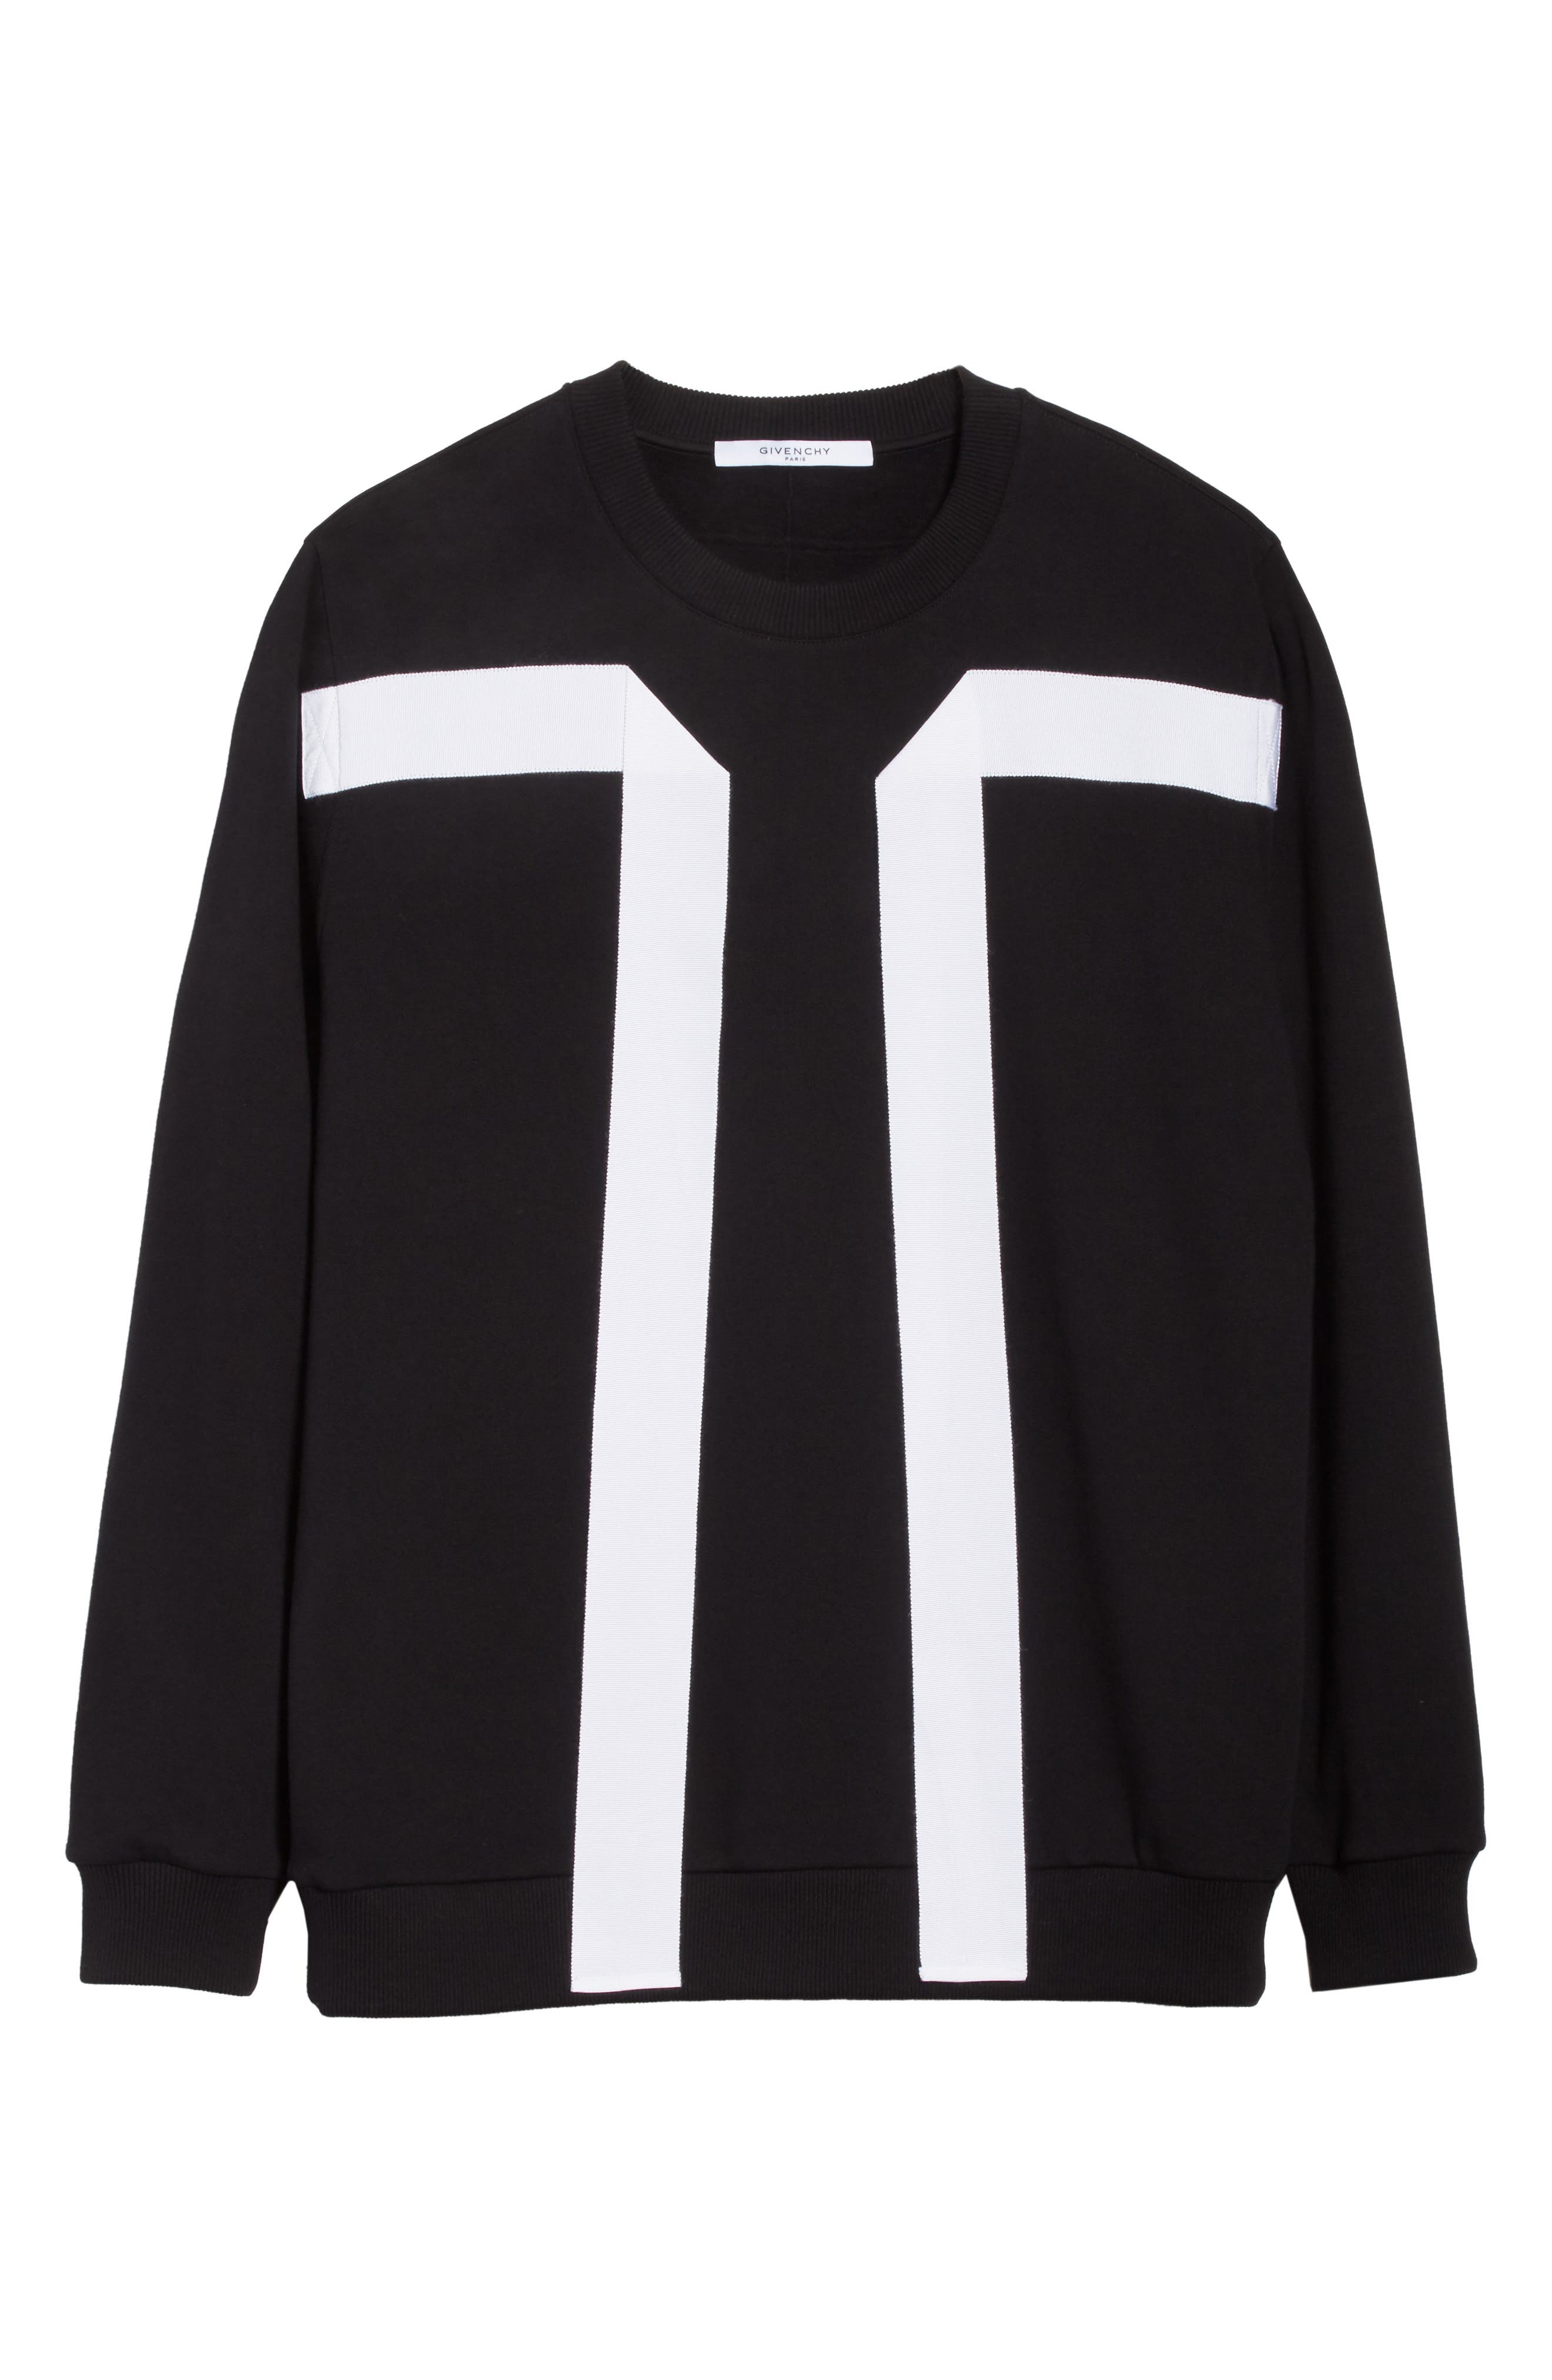 Flying Bands Crewneck Sweatshirt,                             Alternate thumbnail 6, color,                             Black